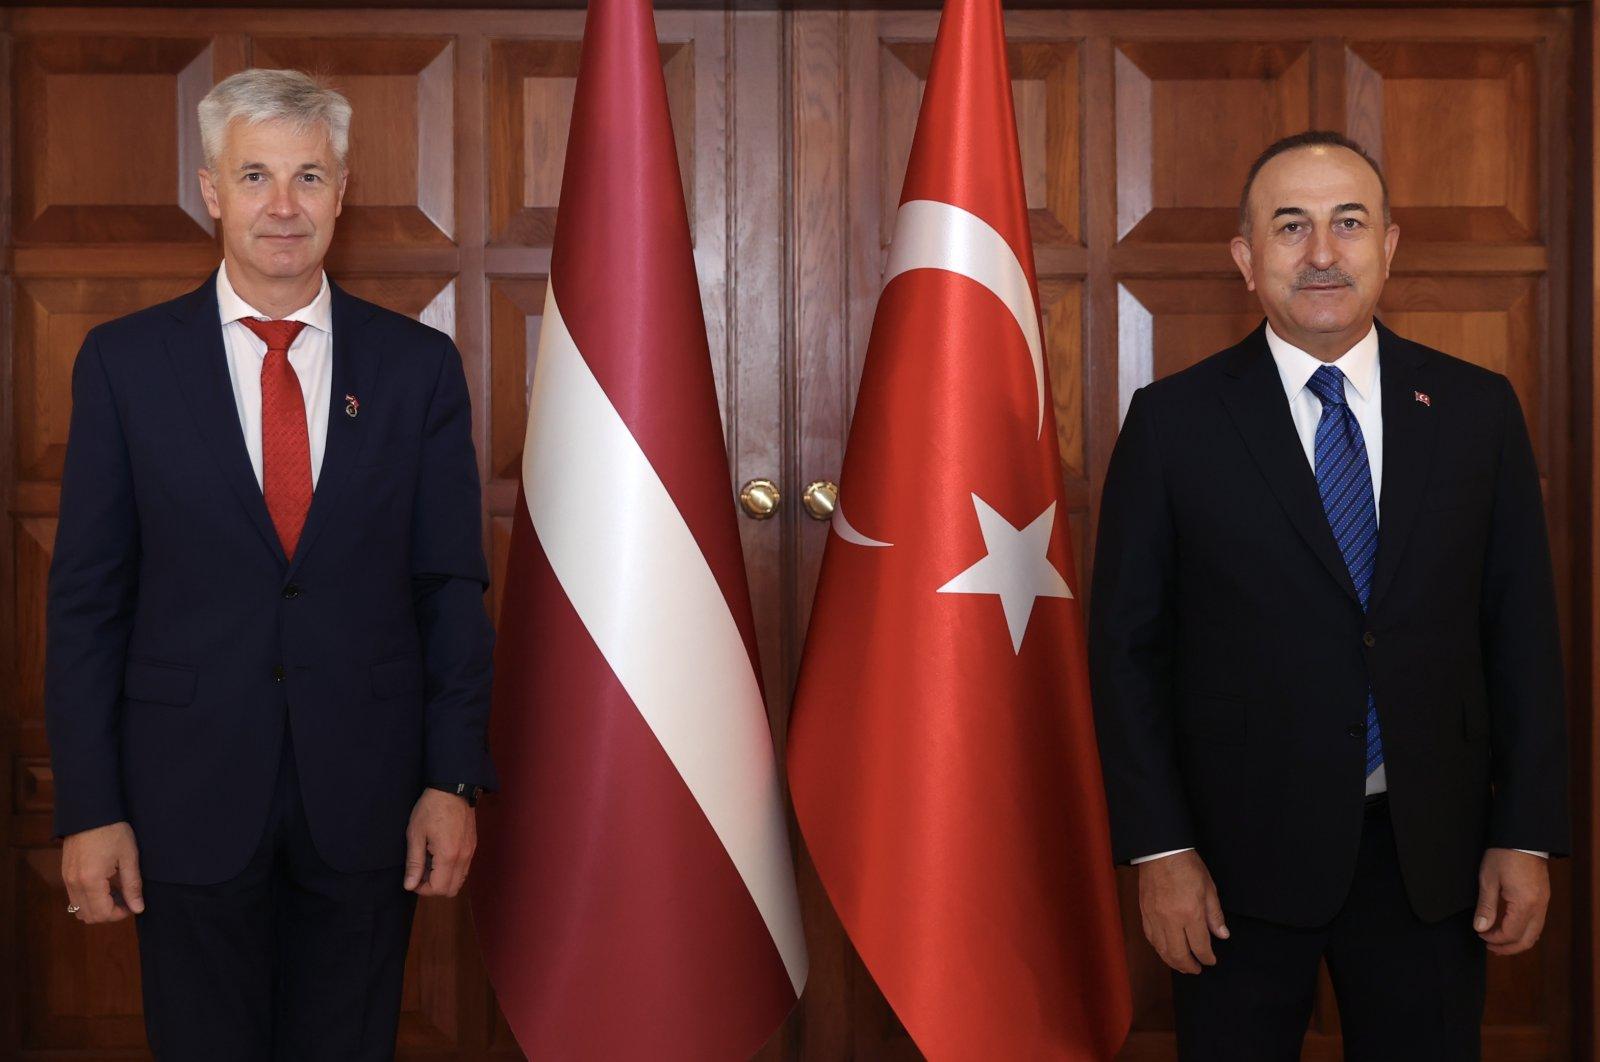 Turkish Foreign Minister Mevlüt Çavuşoğlu (R) receives Latvia's Deputy Prime Minister Artis Pabriks in the capital, Ankara, Turkey, June 8, 2021. (AA Photo)